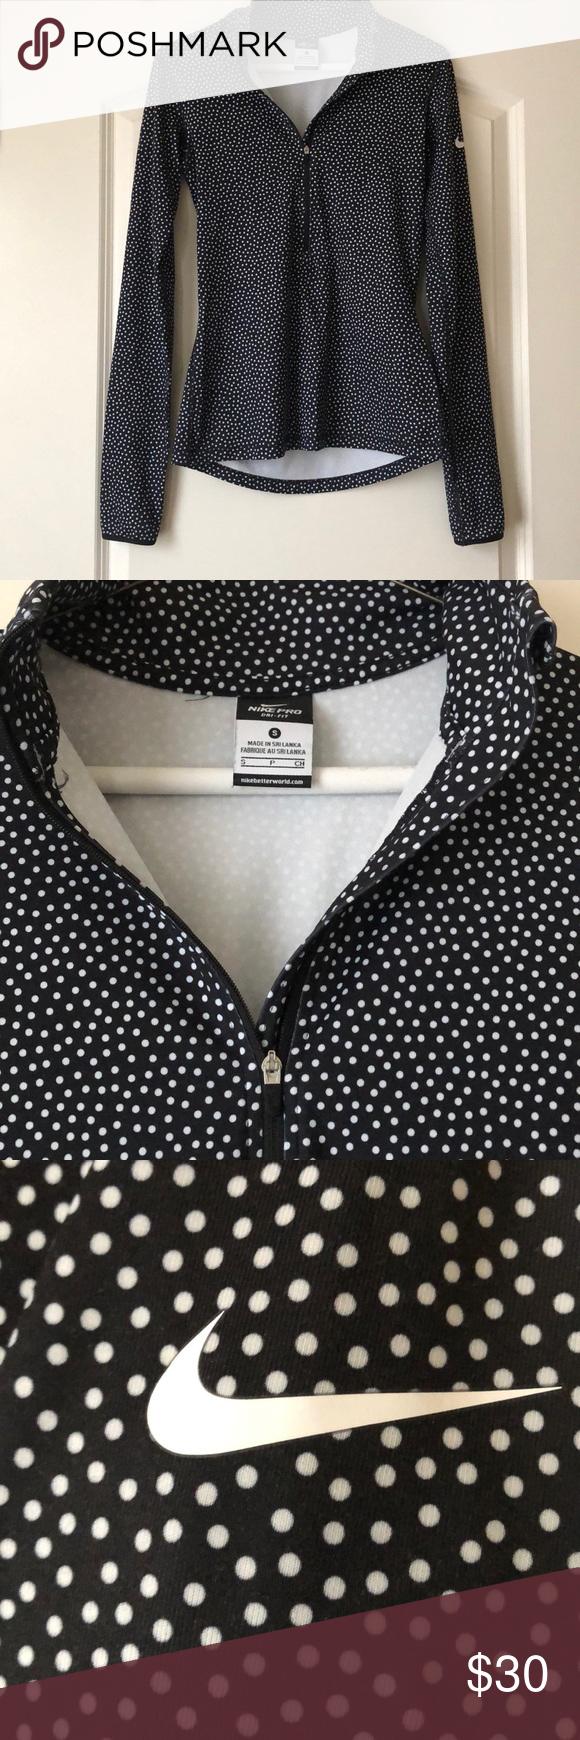 Predownload: Nike Dri Fit Womens Polka Dot Pullover With Zip Fit Women Women Clothes Design [ 1740 x 580 Pixel ]